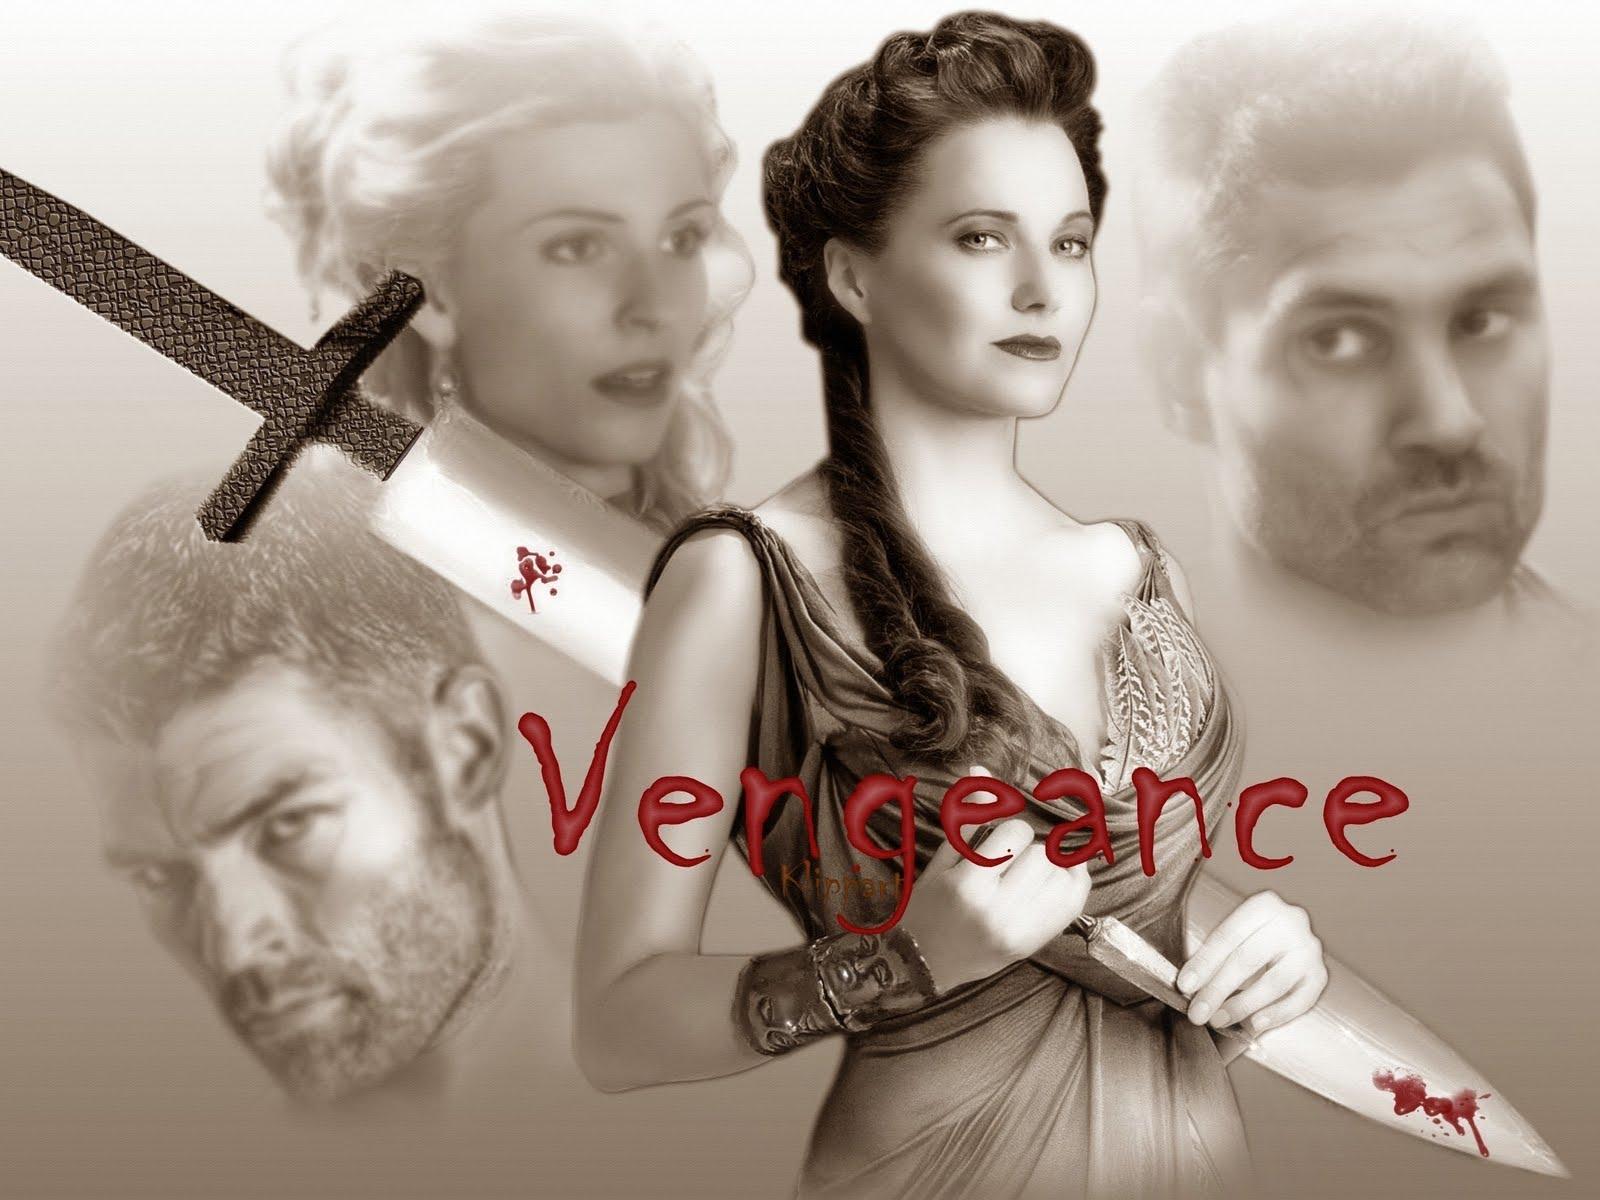 http://3.bp.blogspot.com/-hJDfjZRzq44/Tkn5okmMTKI/AAAAAAAAEy8/Cwm6wYywfjs/s1600/Lucretia%2527s+Vengeance.jpg